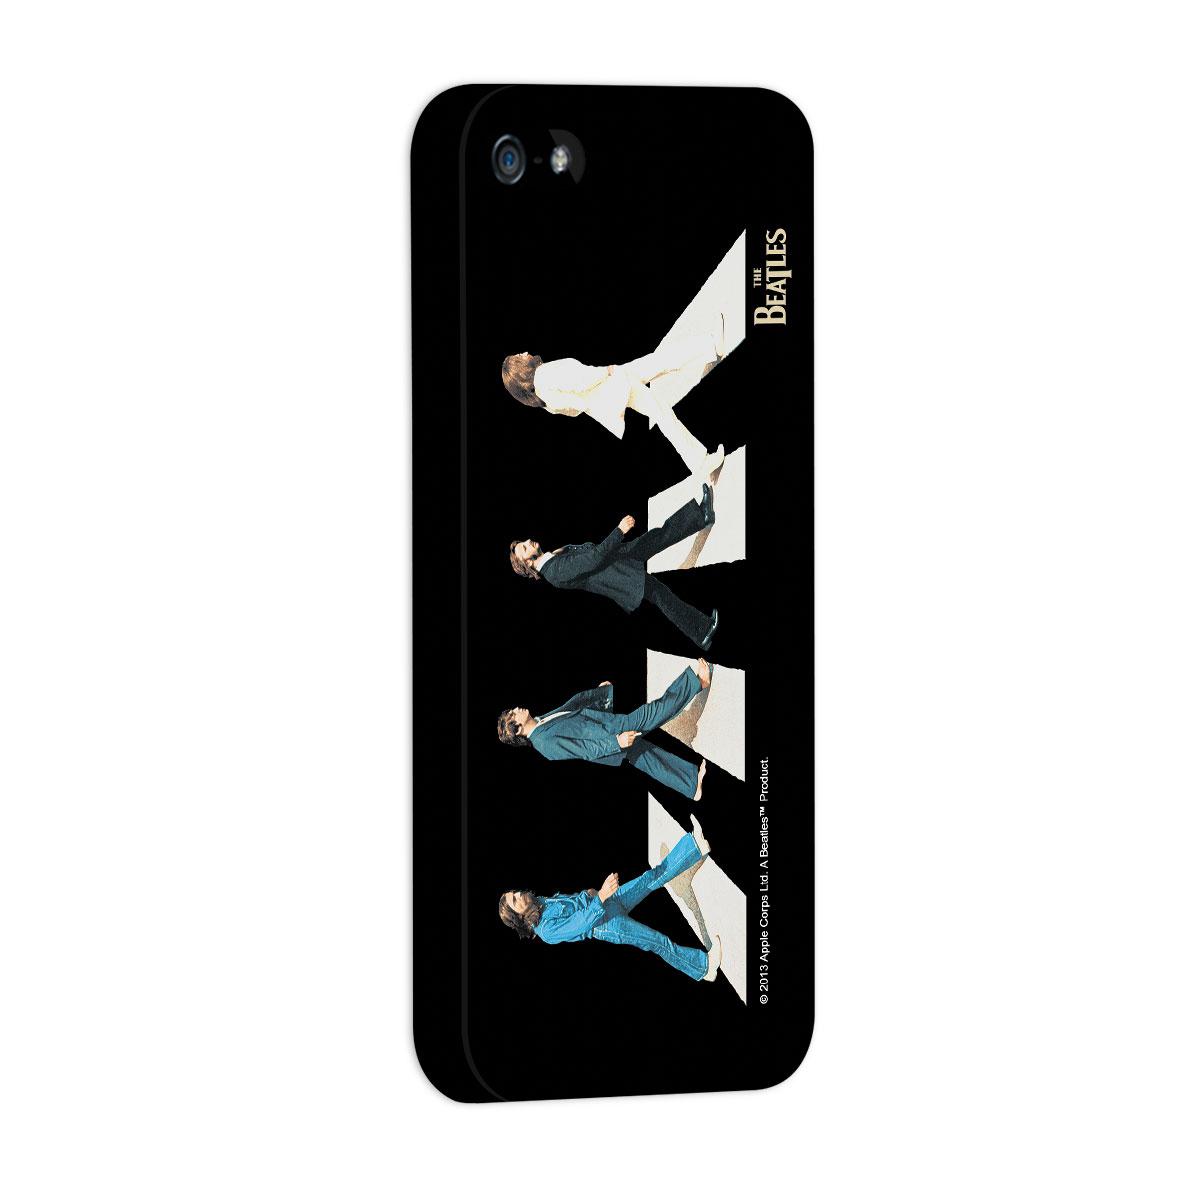 Capa de iPhone 5/5S The Beatles Abbey Road